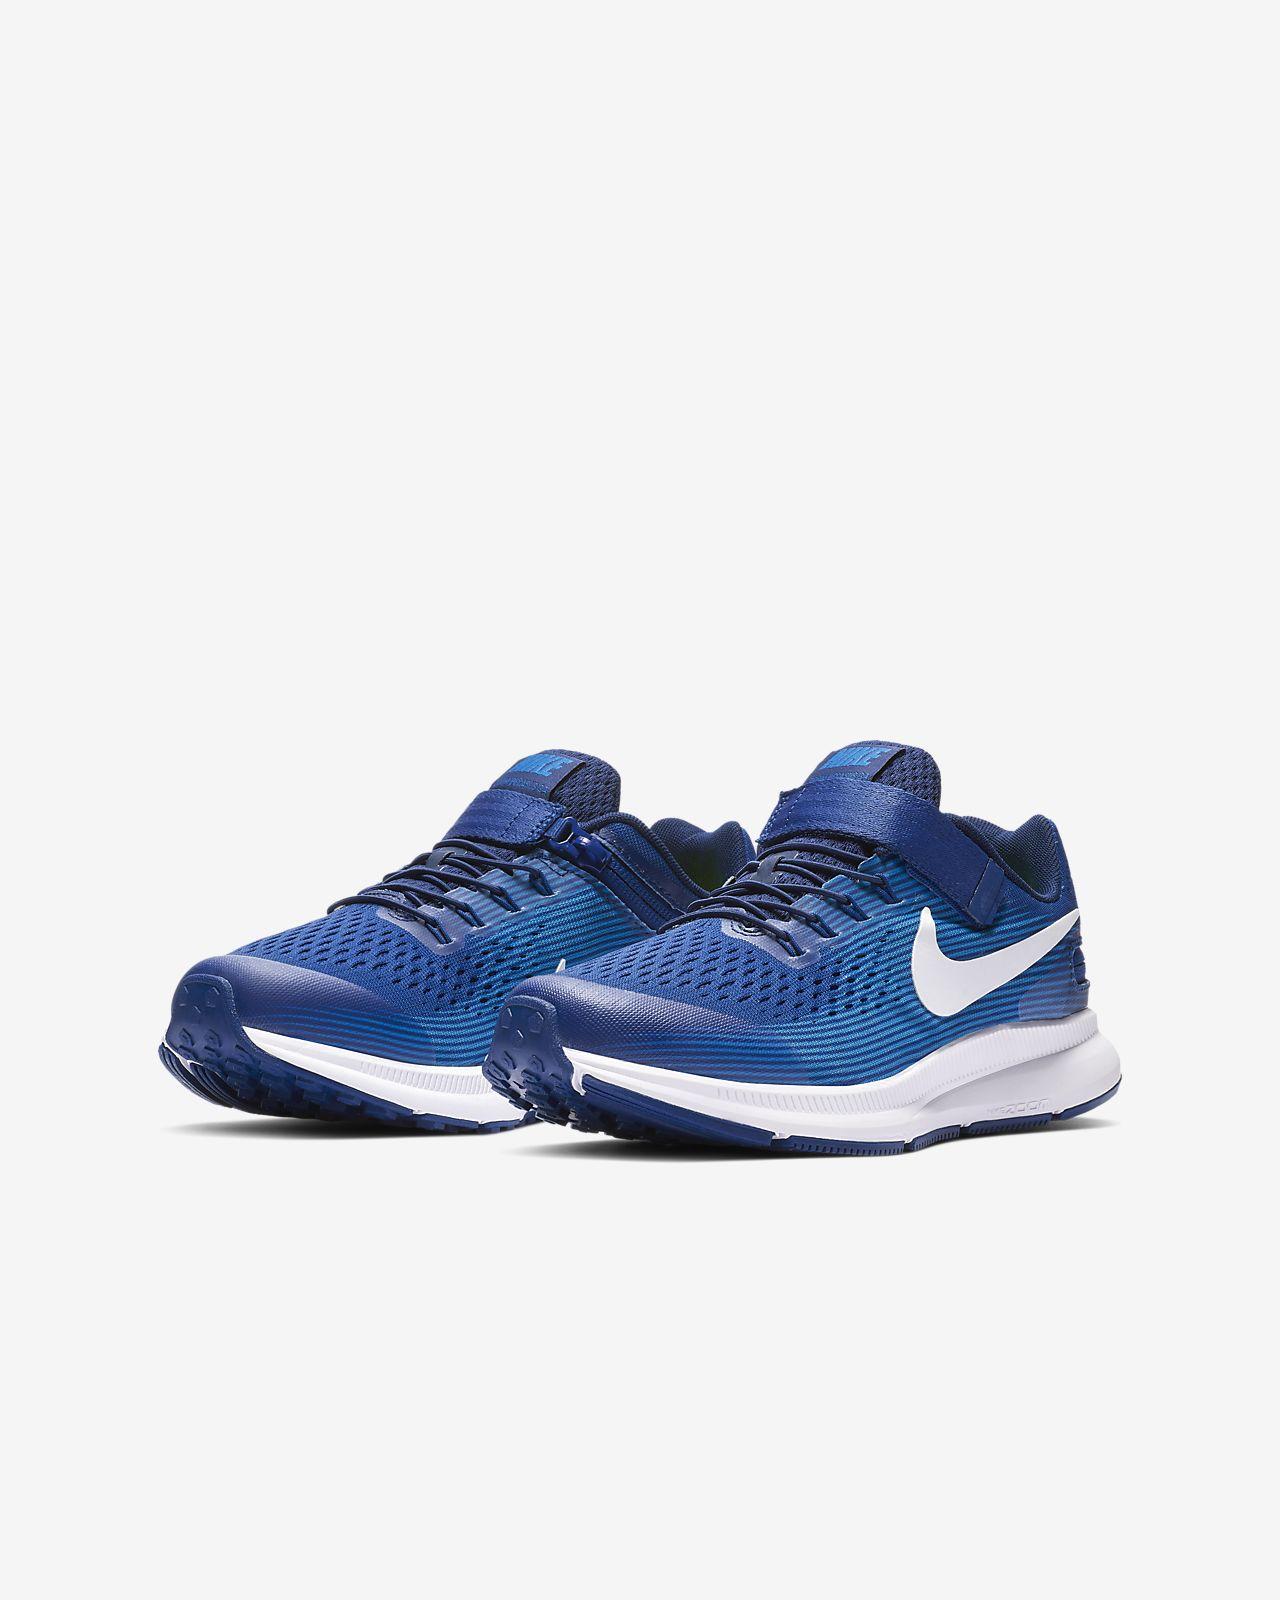 1296aa73928f93 Nike Zoom Pegasus 34 FlyEase Older Kids  Running Shoe. Nike.com CA